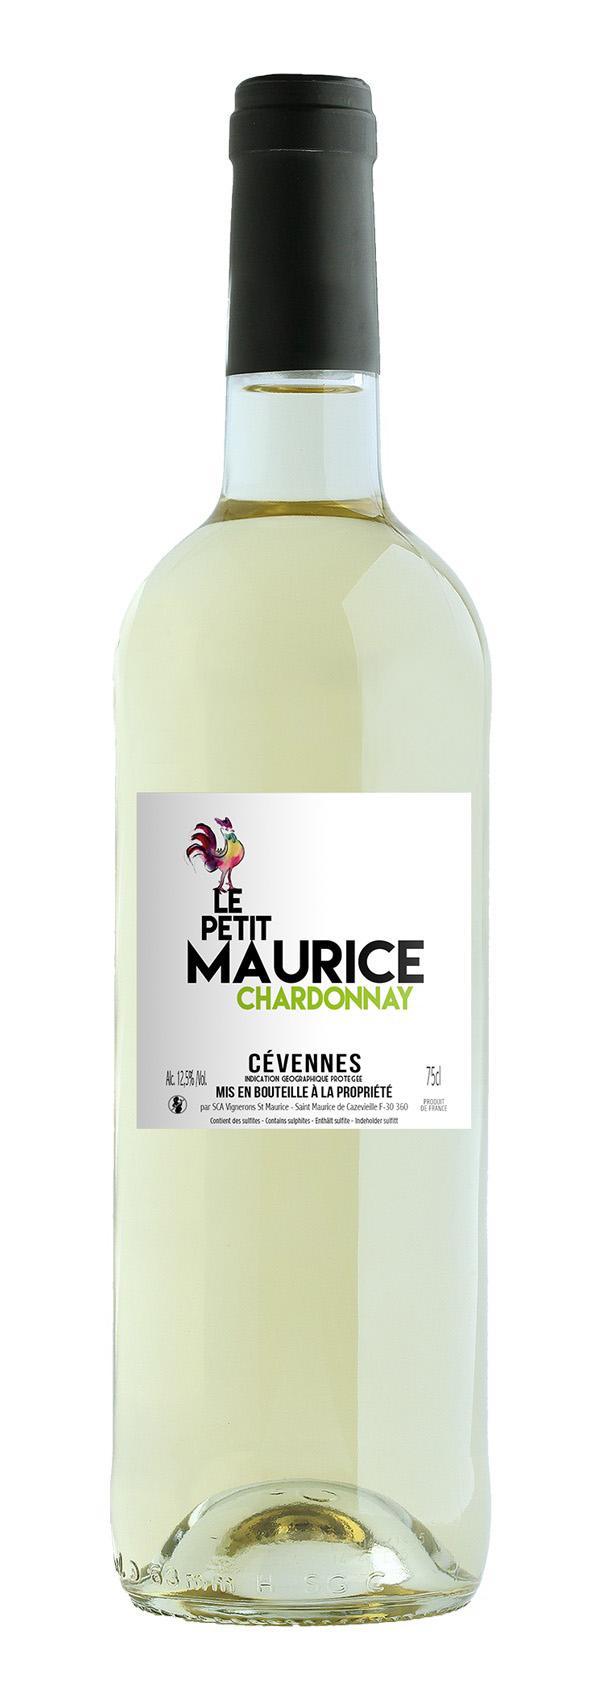 Le Petit Maurice Blanc Chardonnay